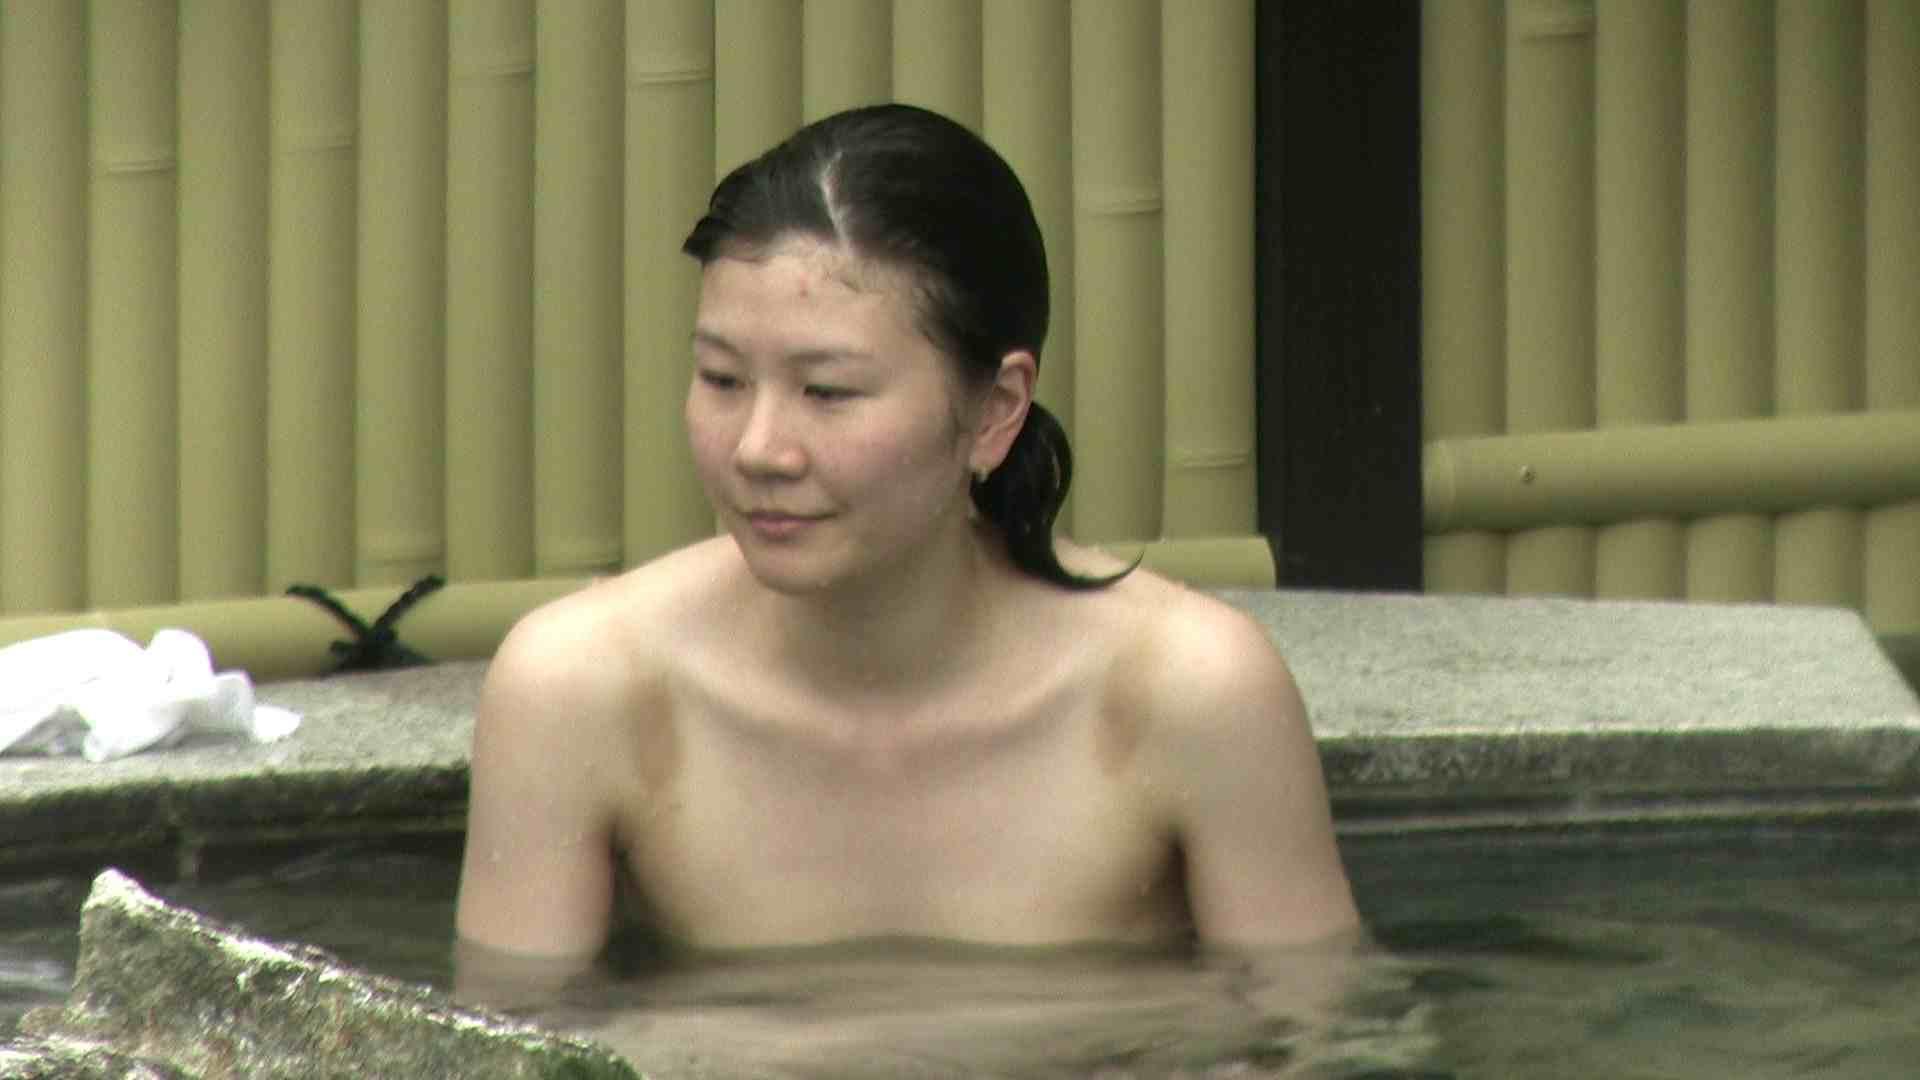 Aquaな露天風呂Vol.187 盗撮  63連発 3